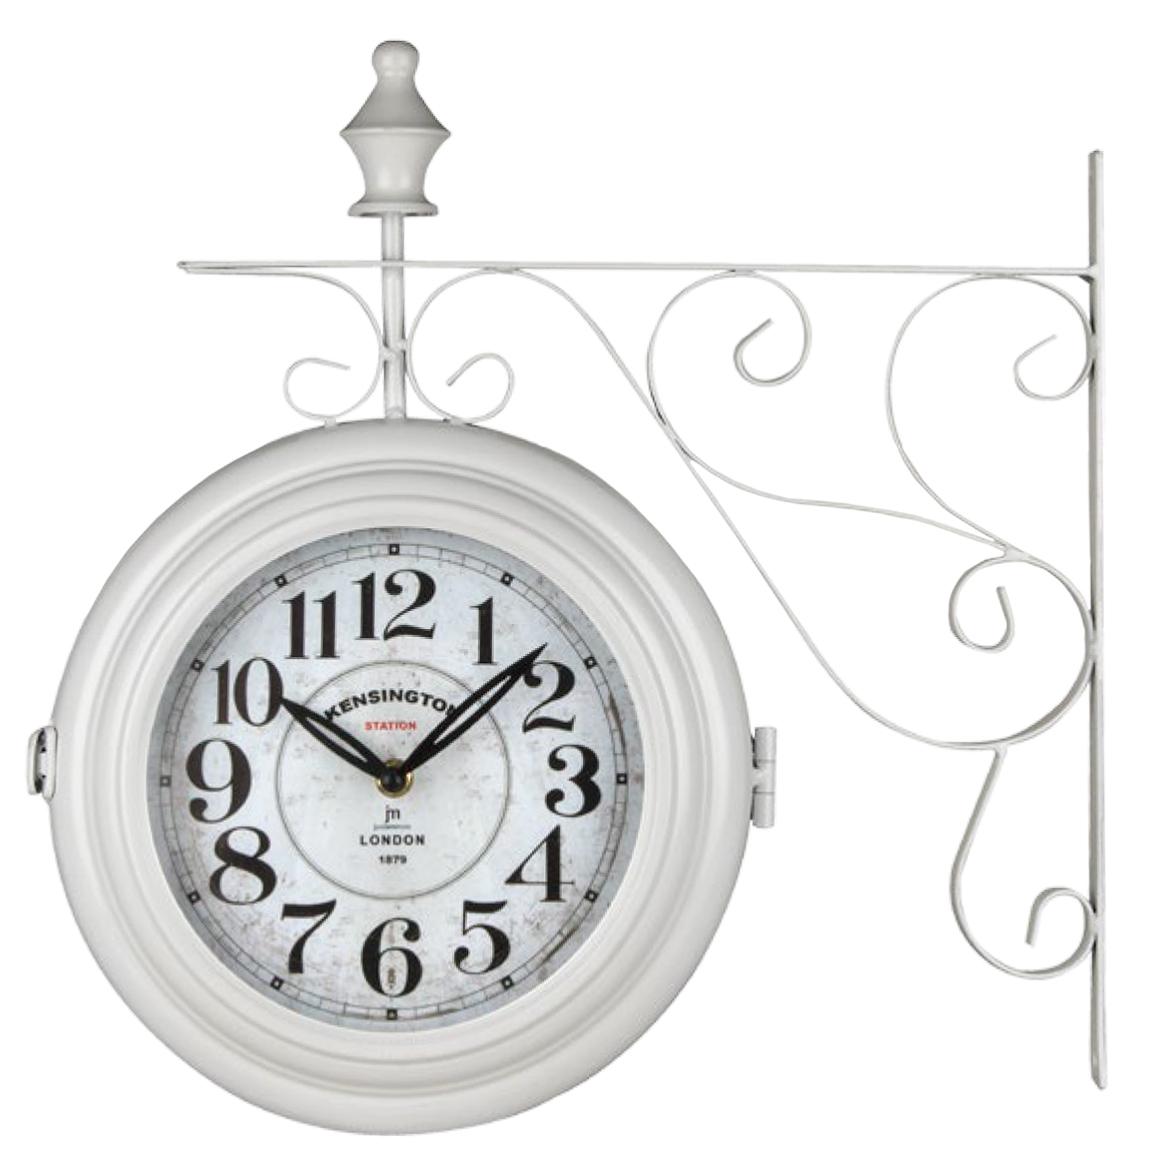 Часы настенные Часы настенные Lowell 14753 chasy-nastennye-lowell-14753-italiya.jpg